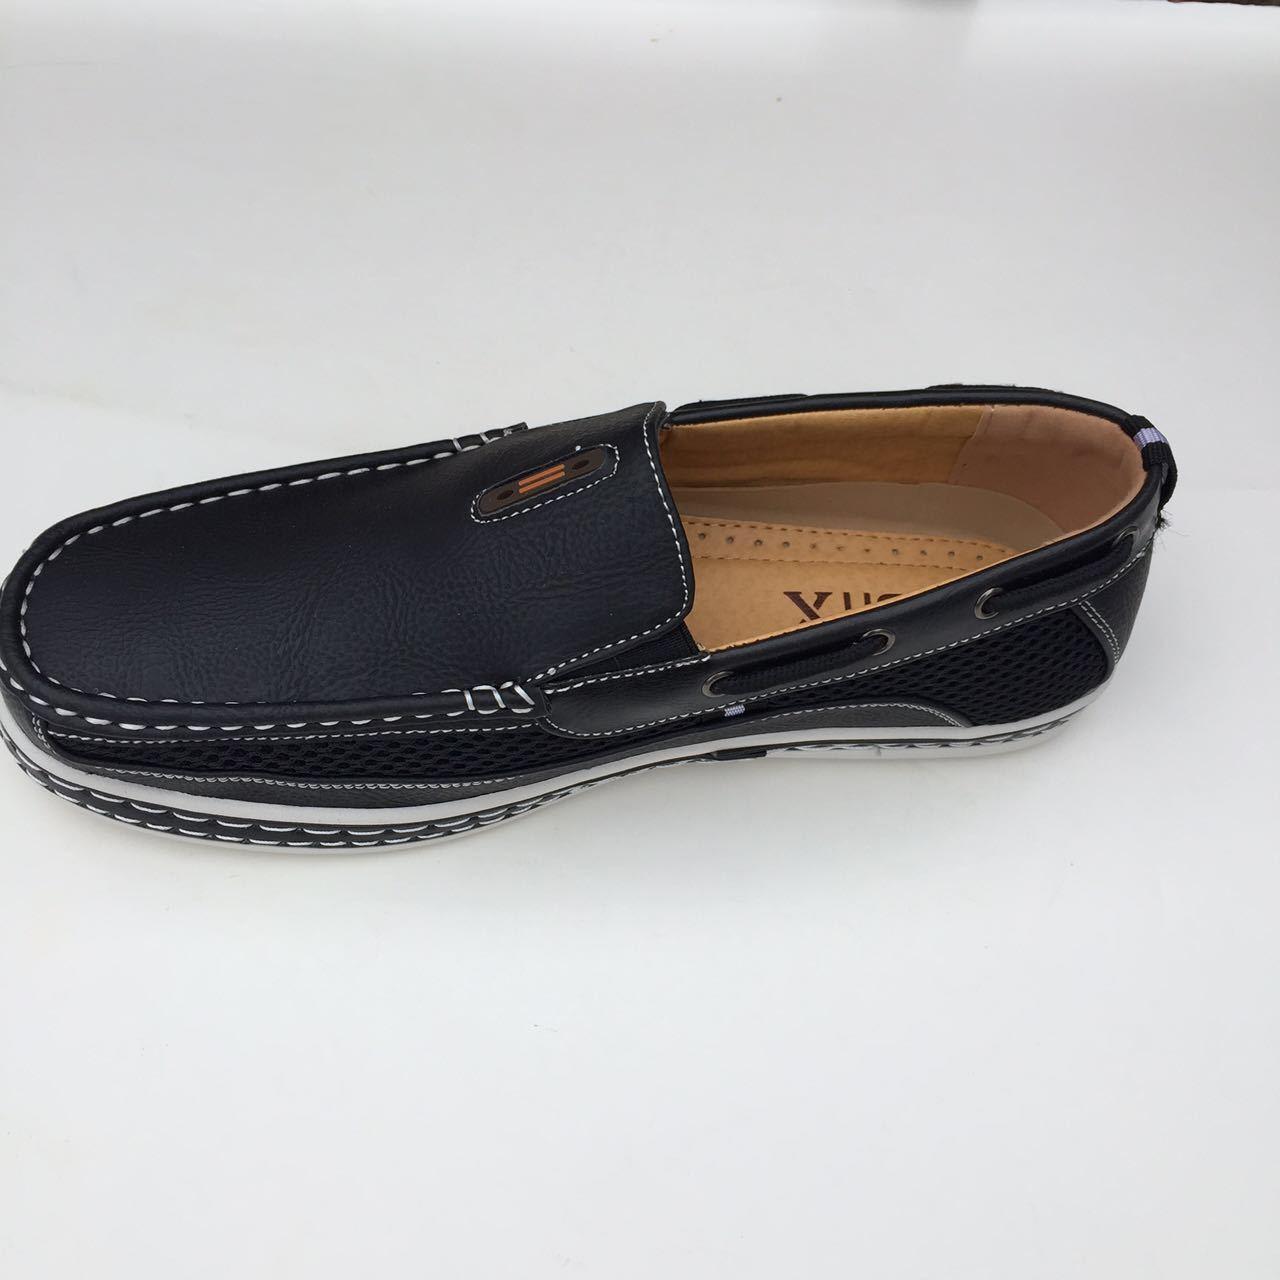 f6cb049c252 קנה Men-Brixton-Boat-Shoes-Driving-Moccasins-Slip-Loafers-Size-7-5 ...